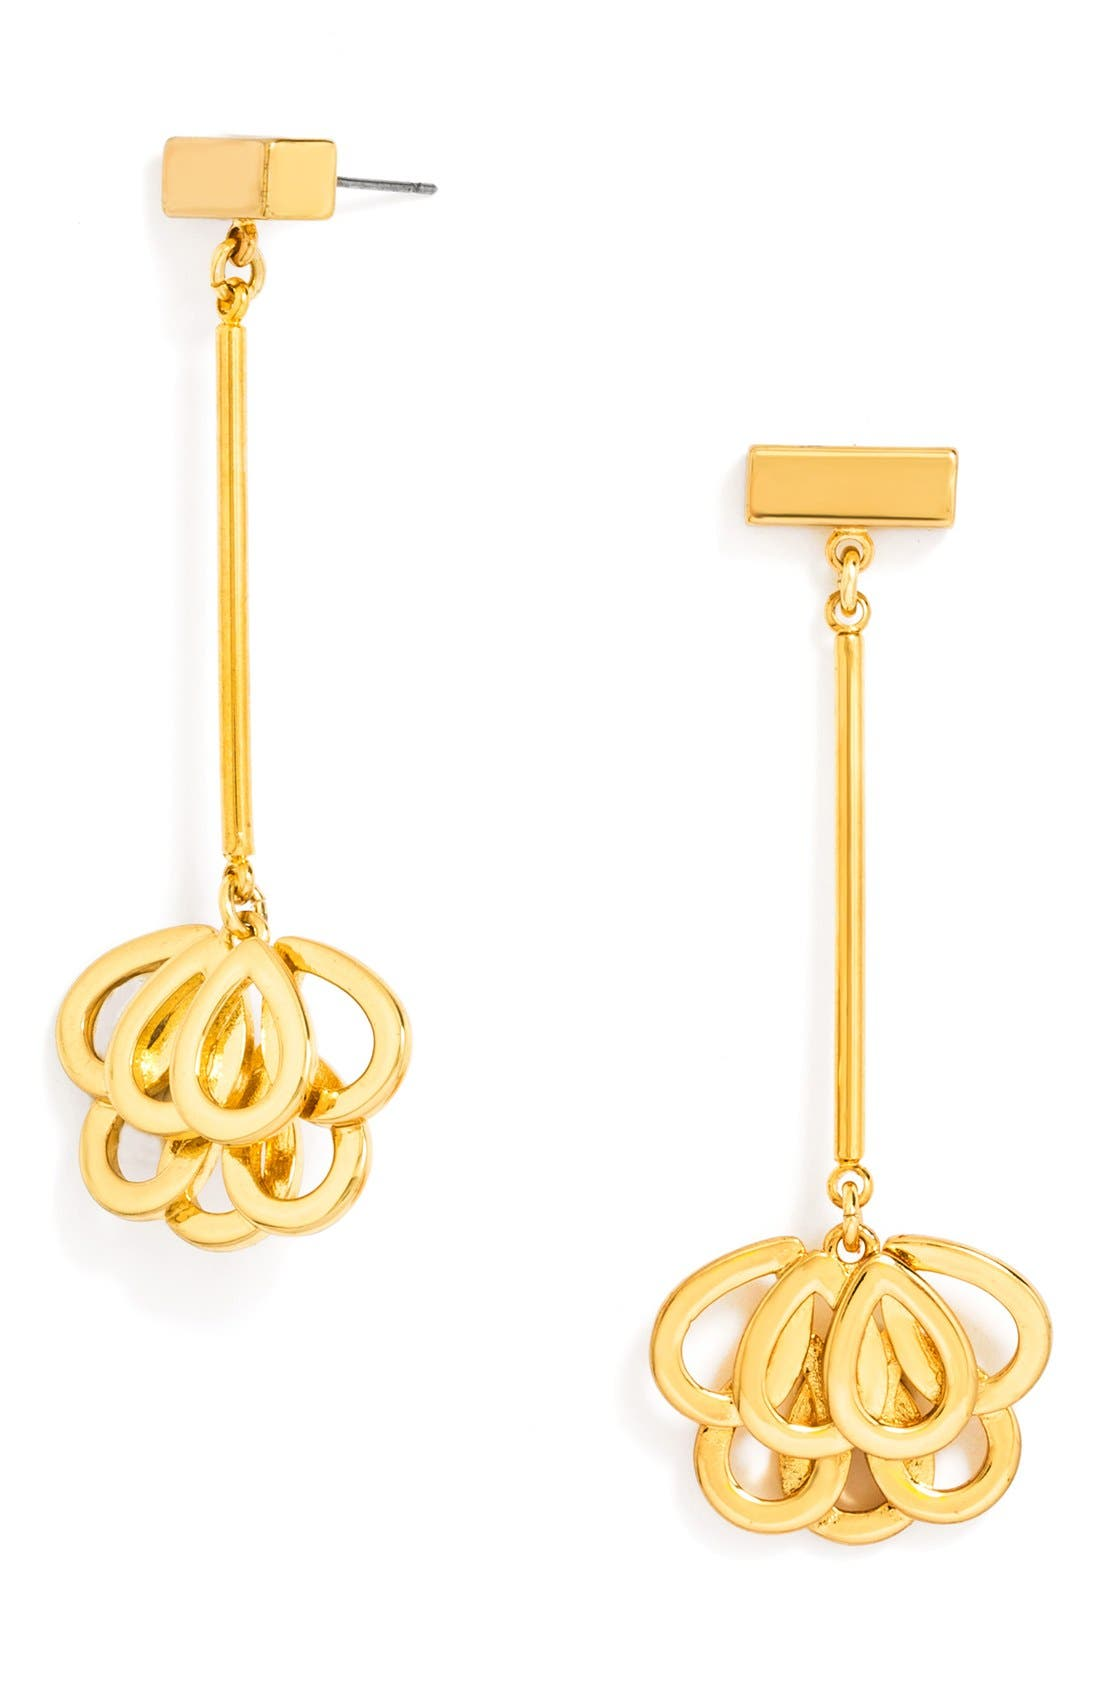 Main Image - BaubleBar 'Partridge' Drop Earrings